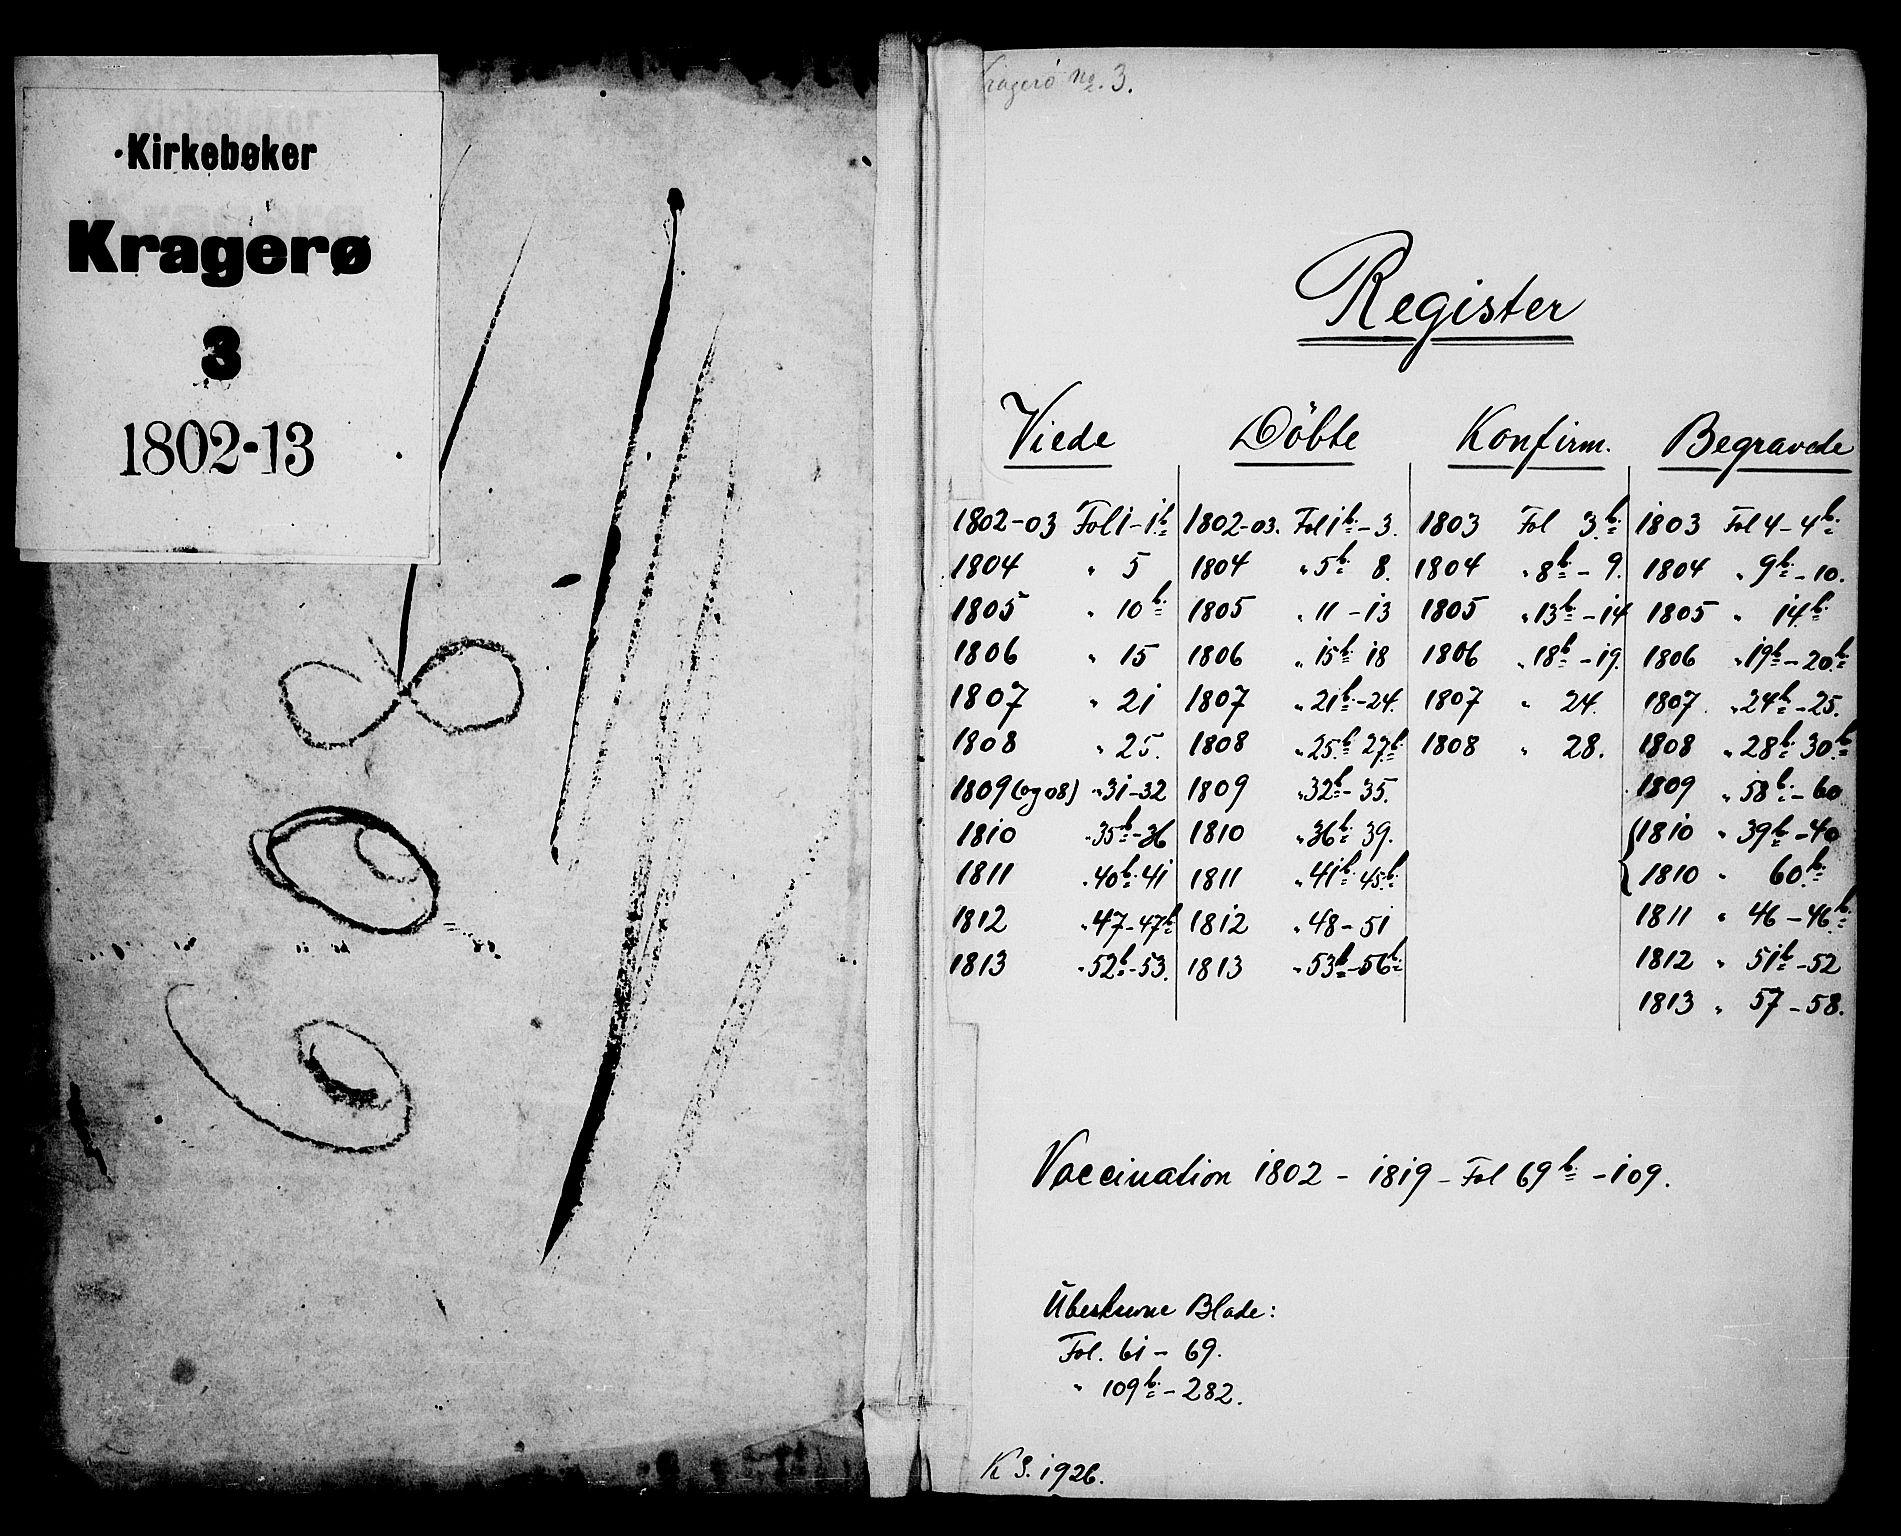 SAKO, Kragerø kirkebøker, F/Fa/L0003: Ministerialbok nr. 3, 1802-1813